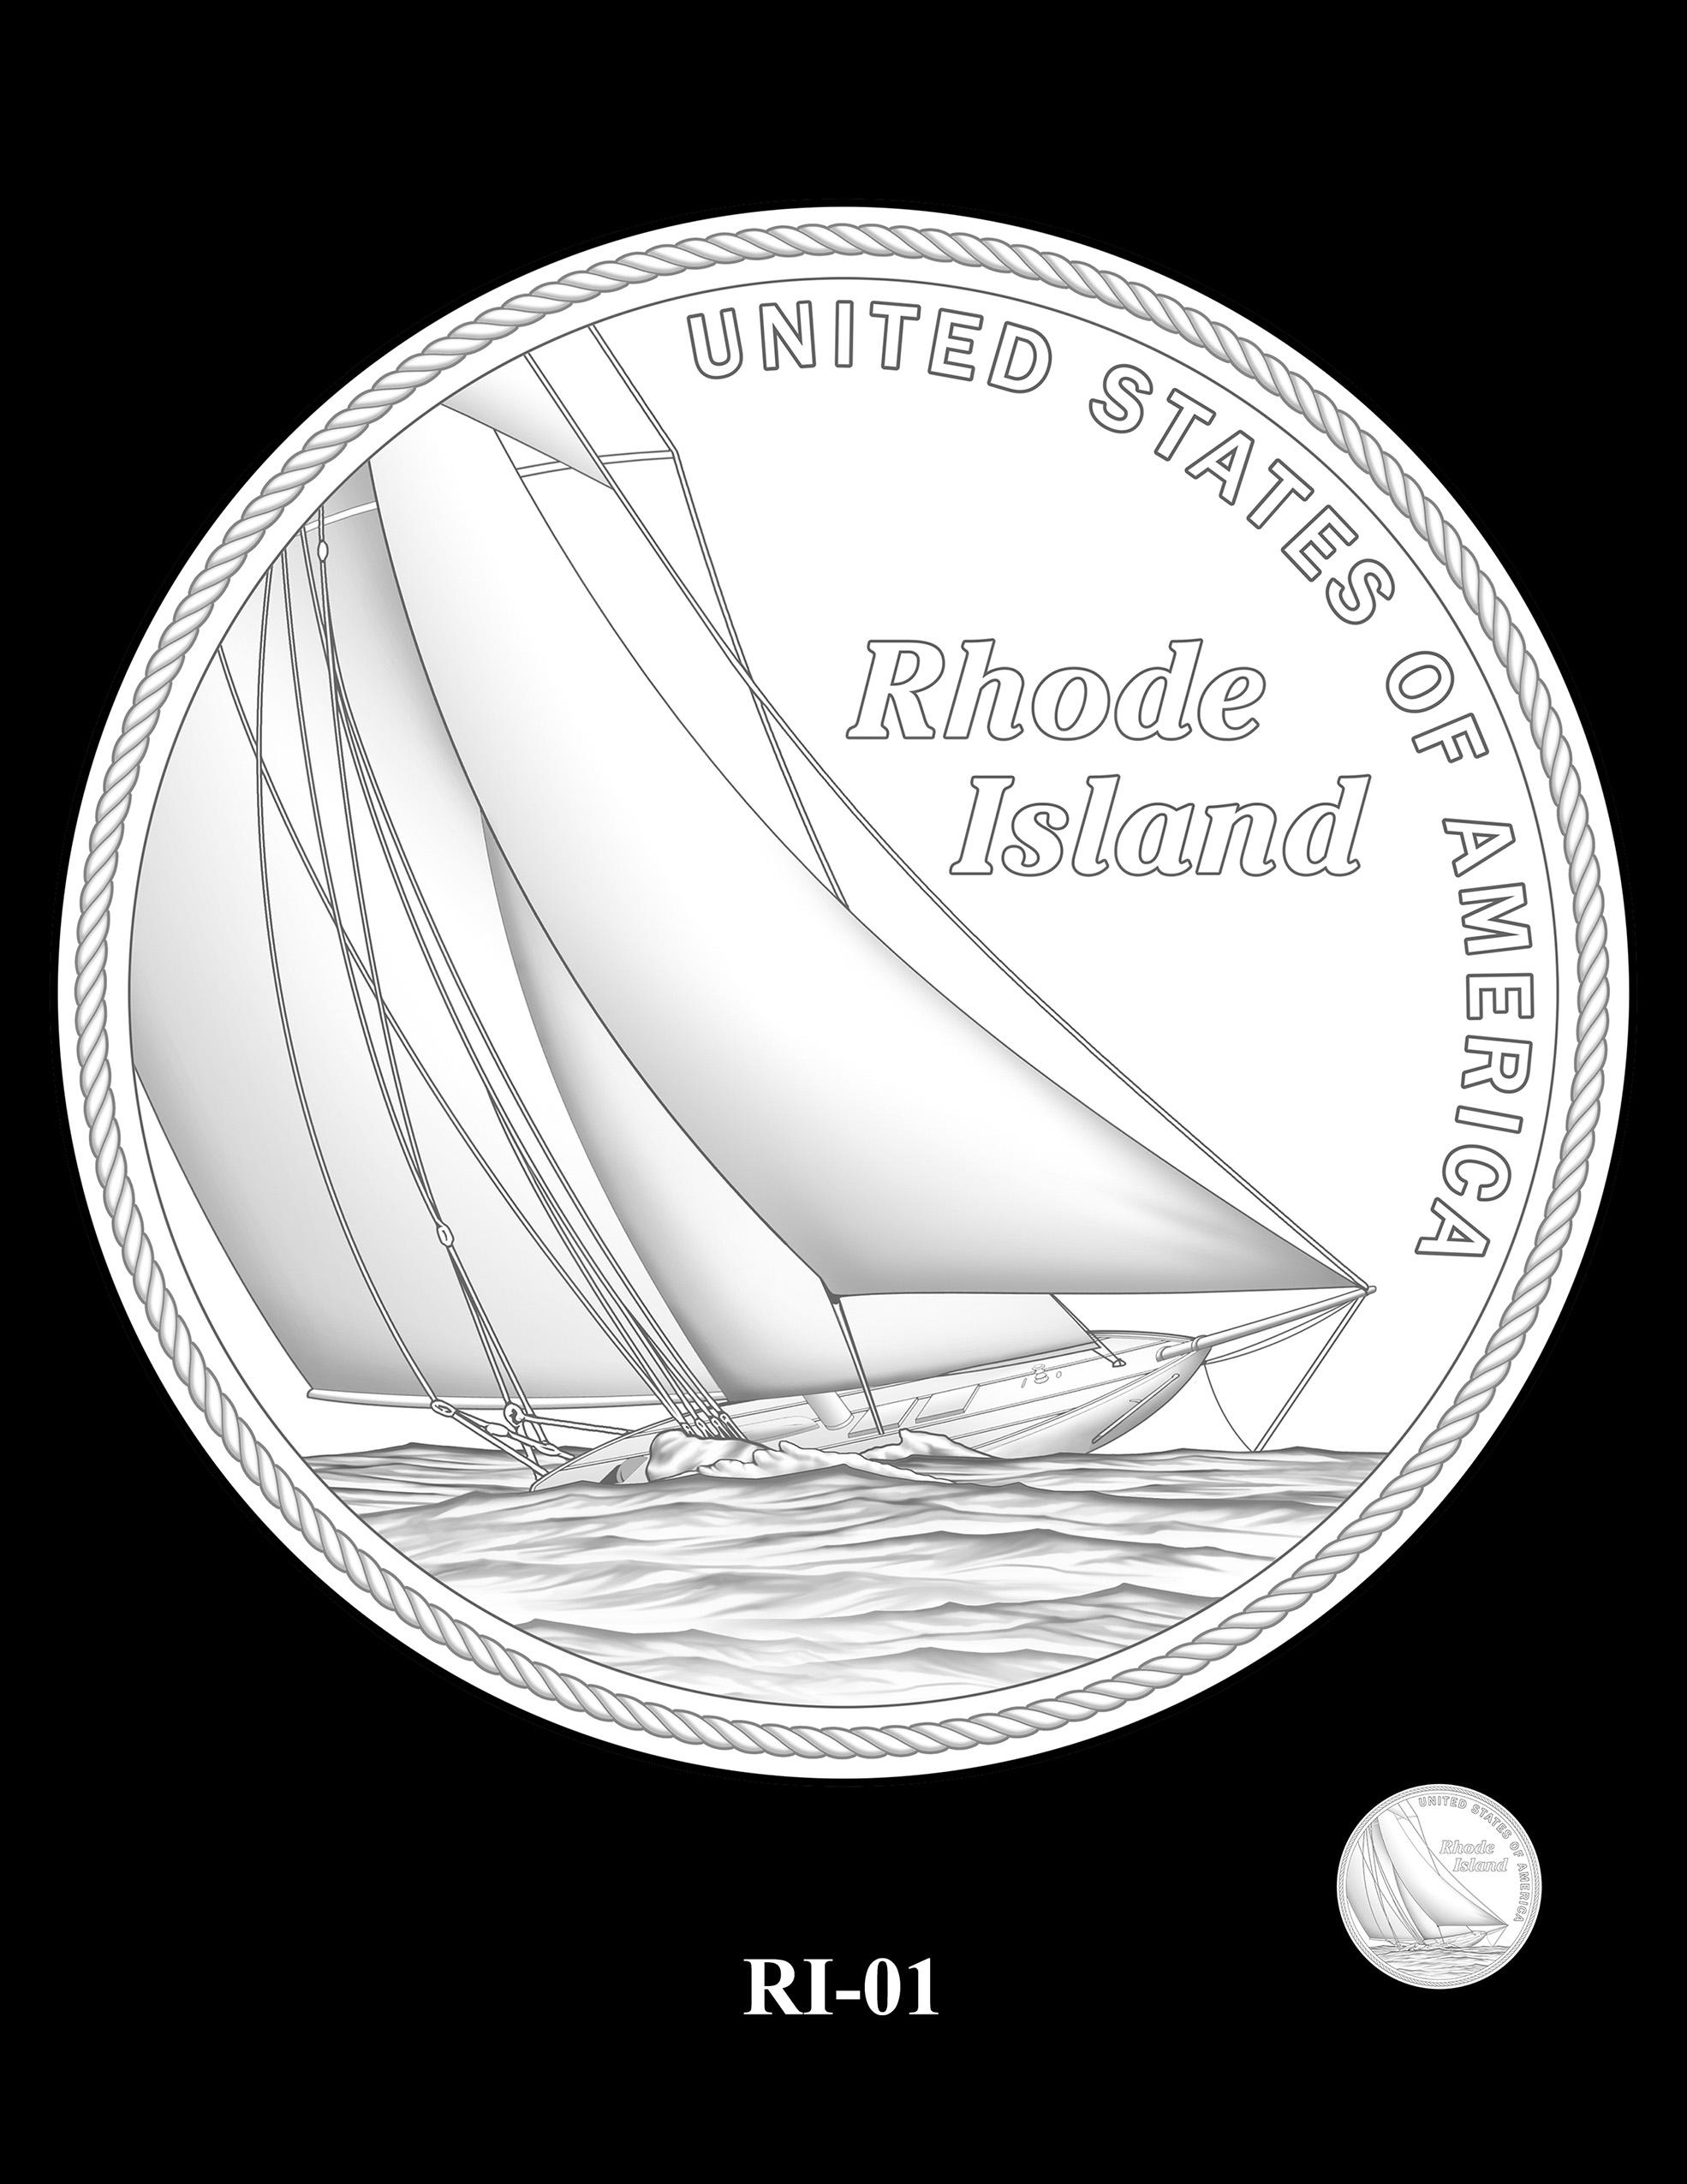 RI-01 -- 2022 American Innovation $1 Coin - Rhode Island